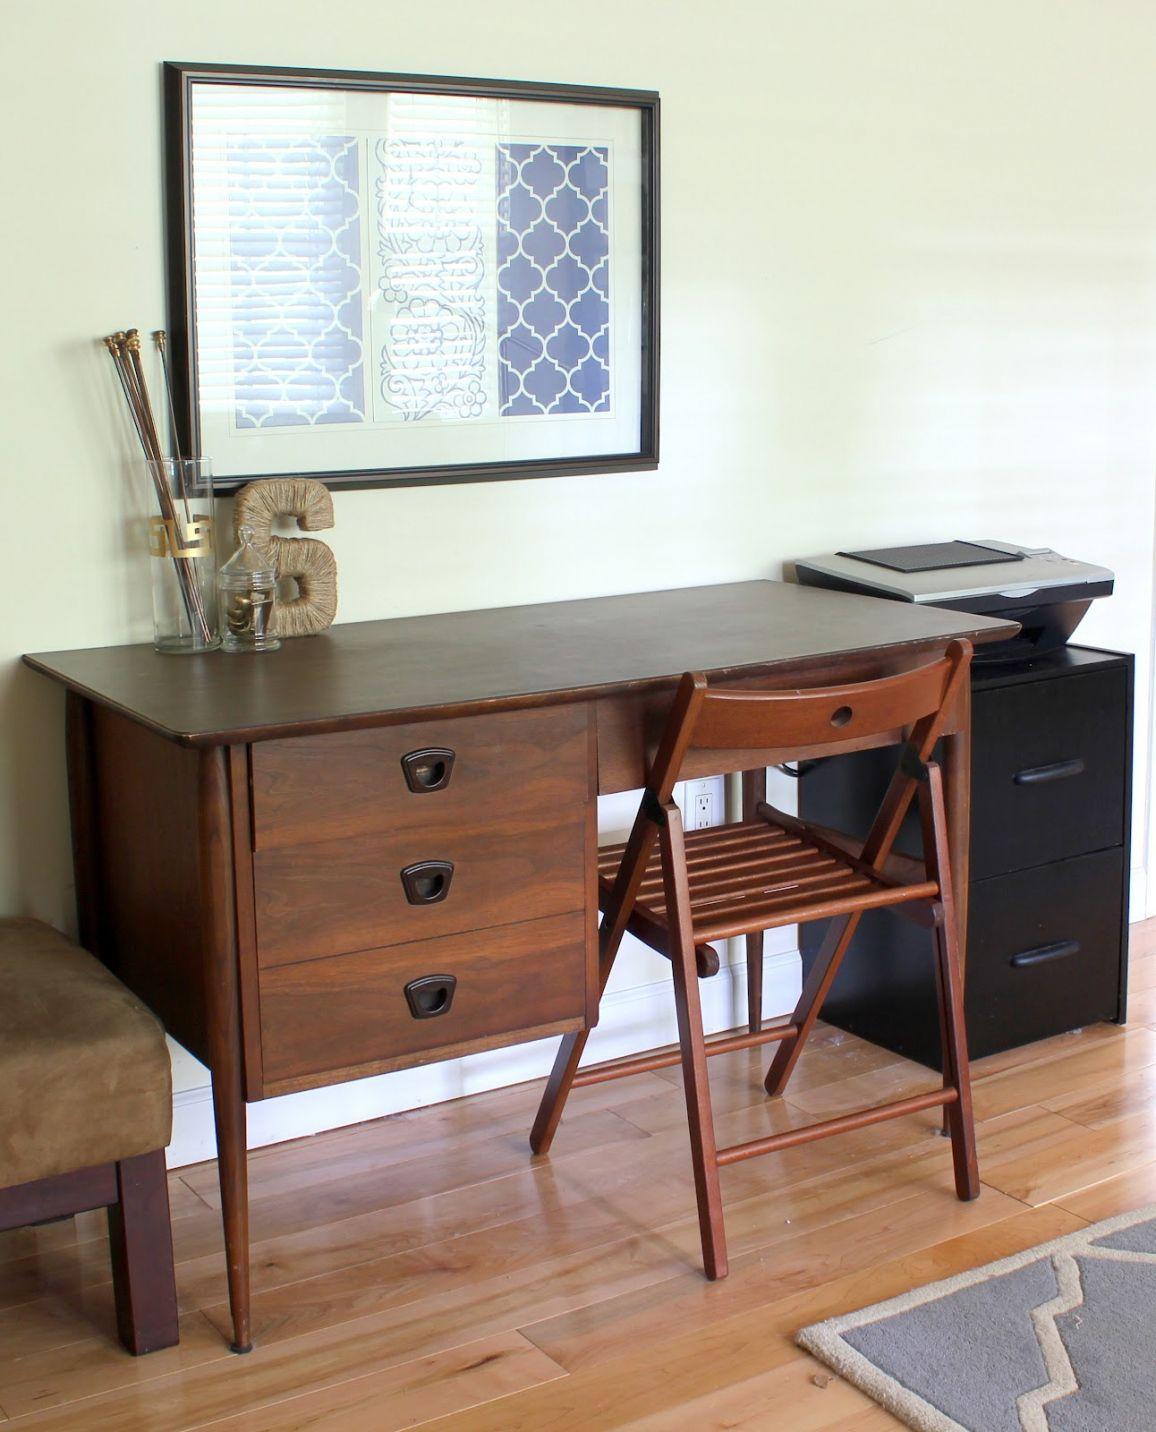 craigslist office desk modern home office furniture check more at rh pinterest com craigslist office furniture orange county craigslist office furniture fargo nd